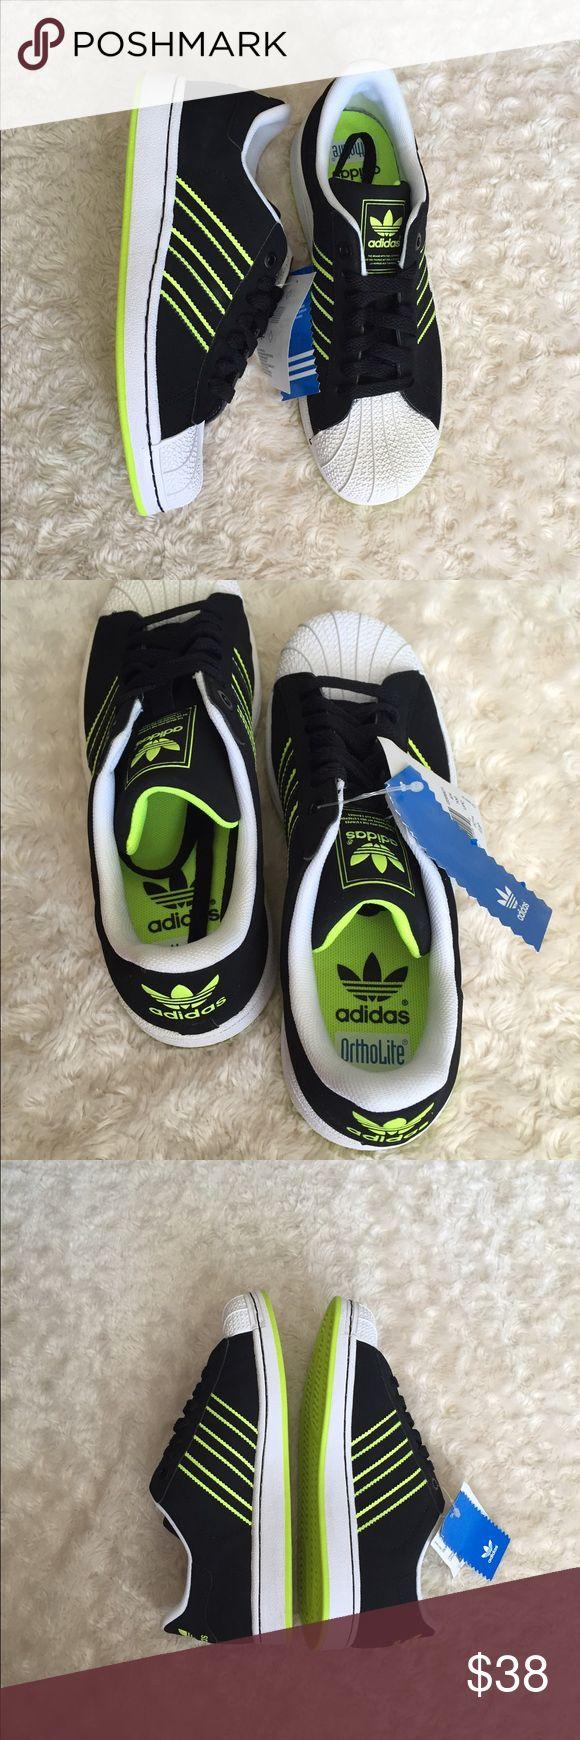 Adidas Superstar Neon